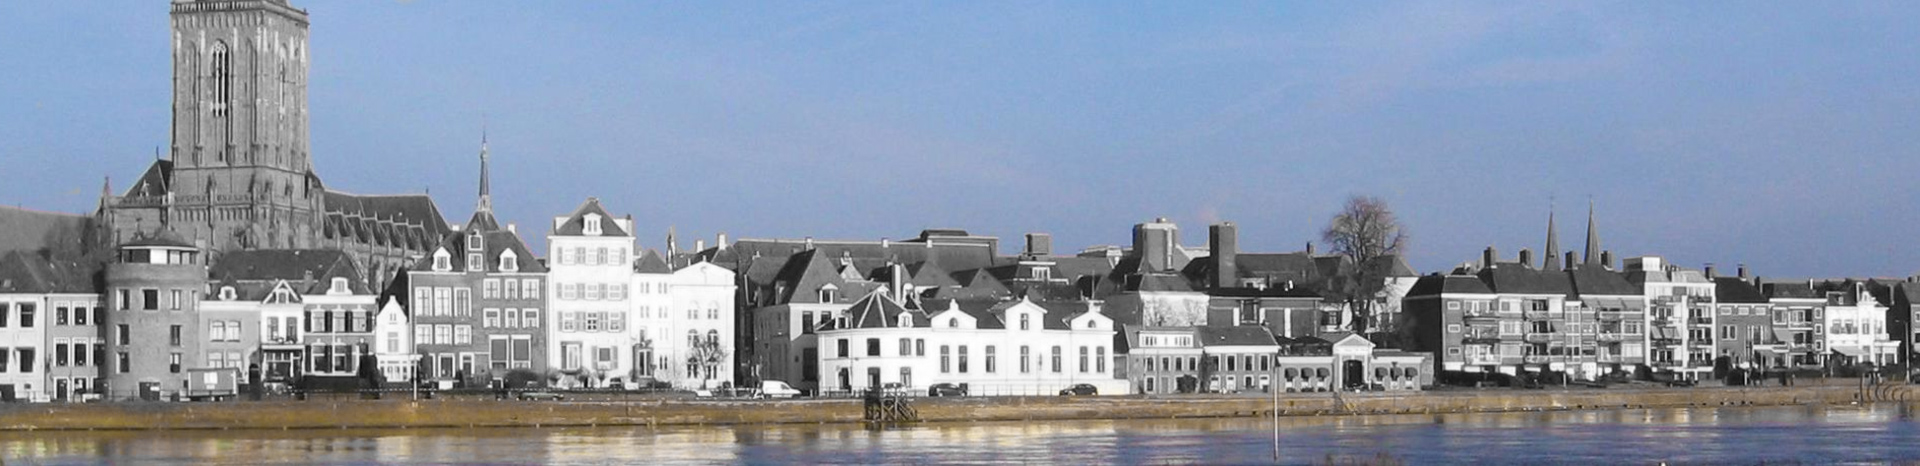 Letselschade advocaat Deventer | LetselPro